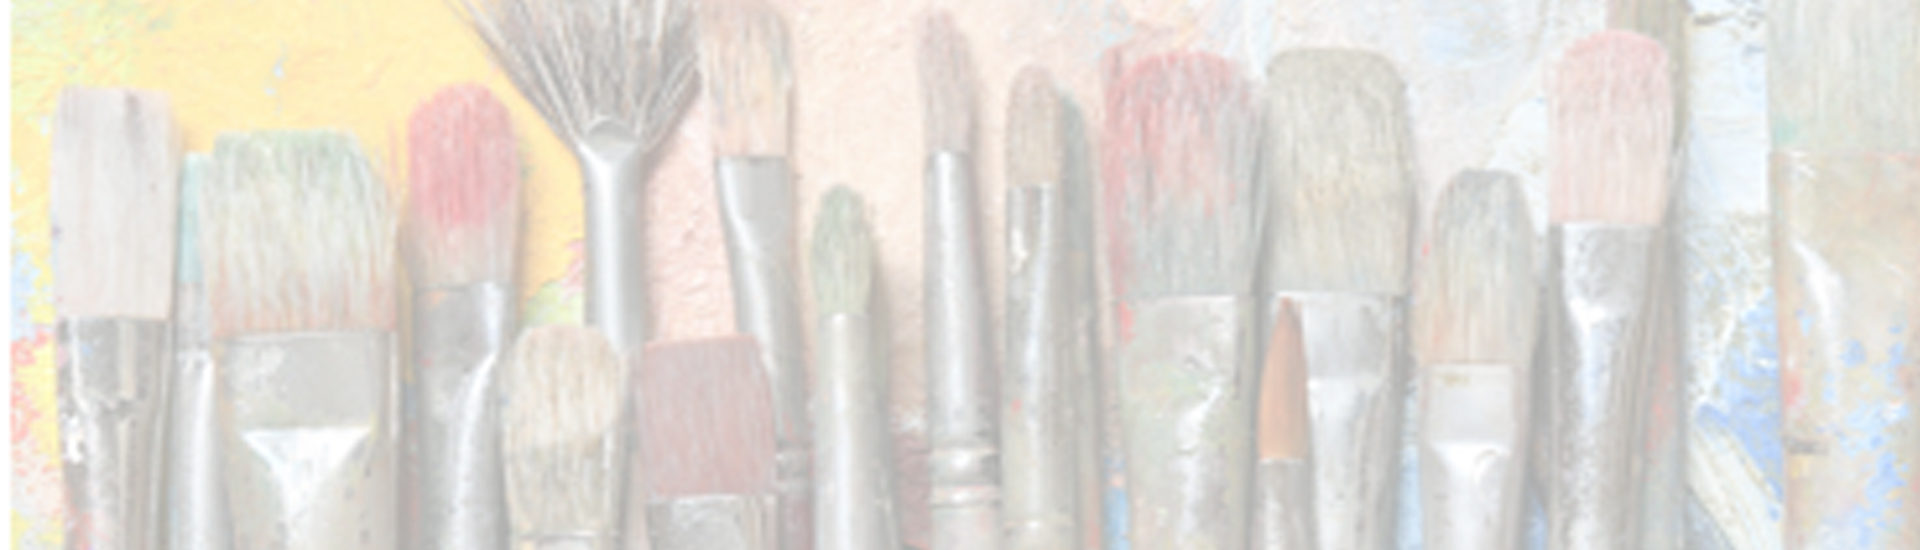 cropped-dirty-brushes-long.jpg